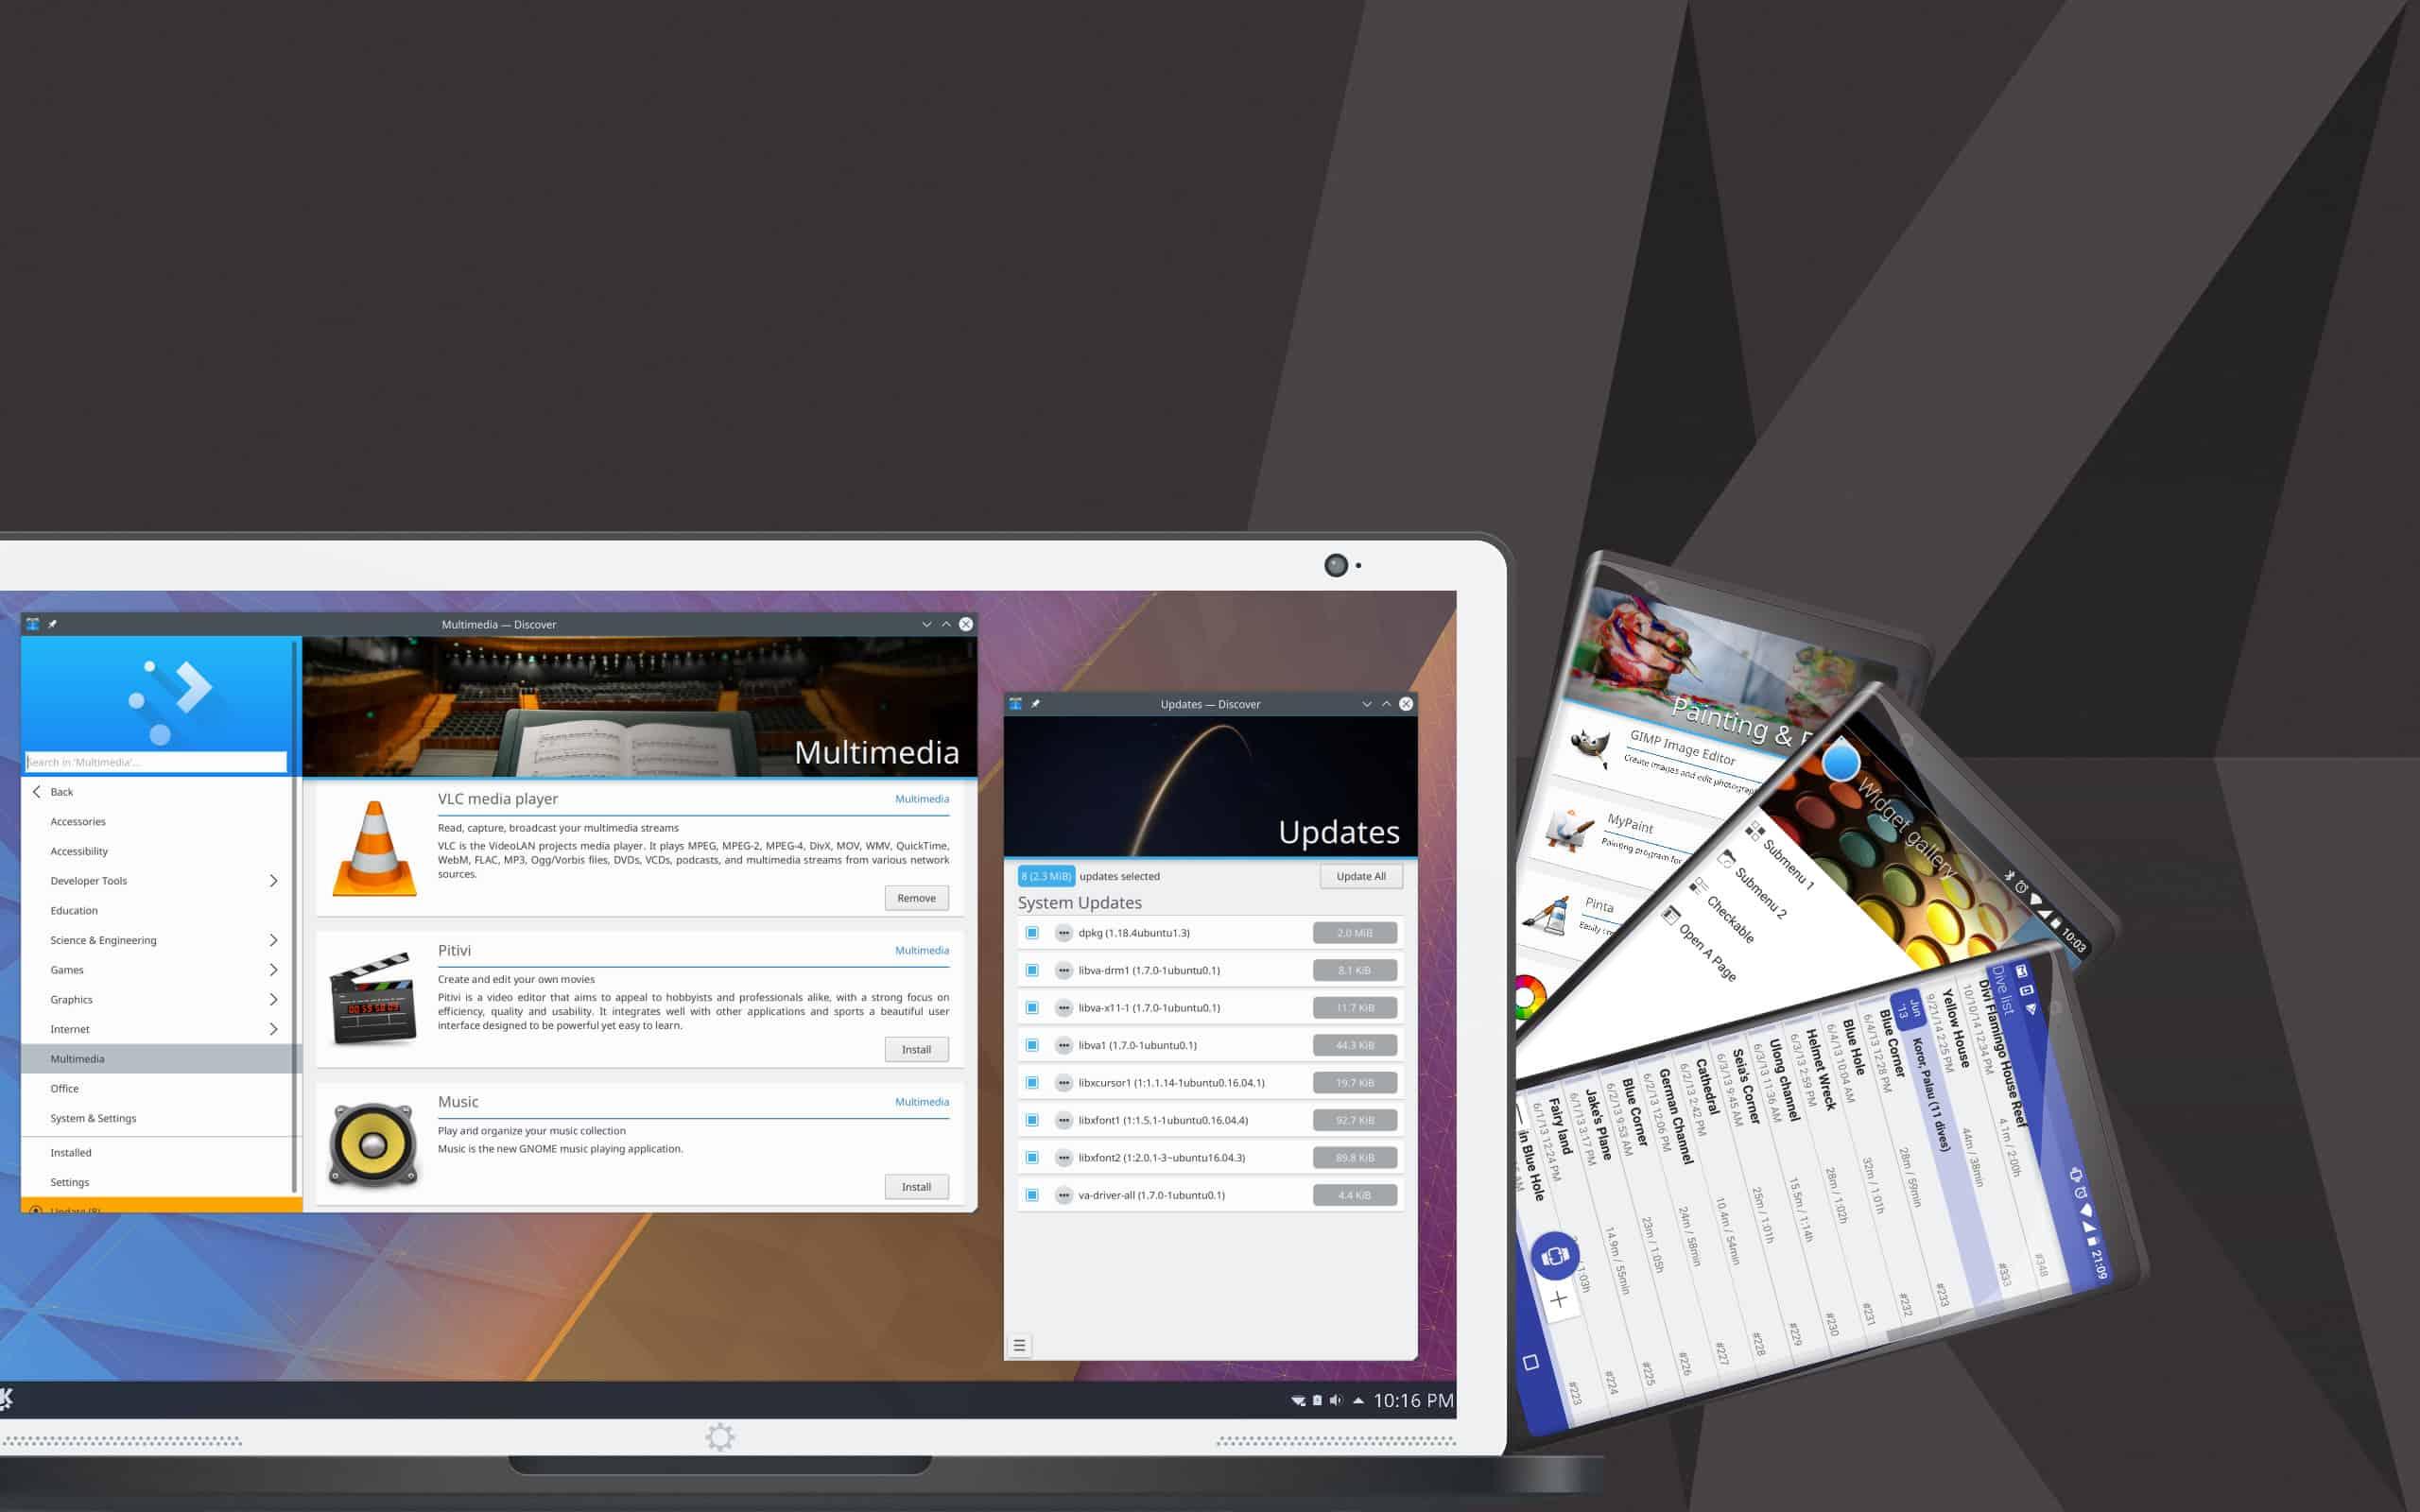 KDE Linux desktop environent